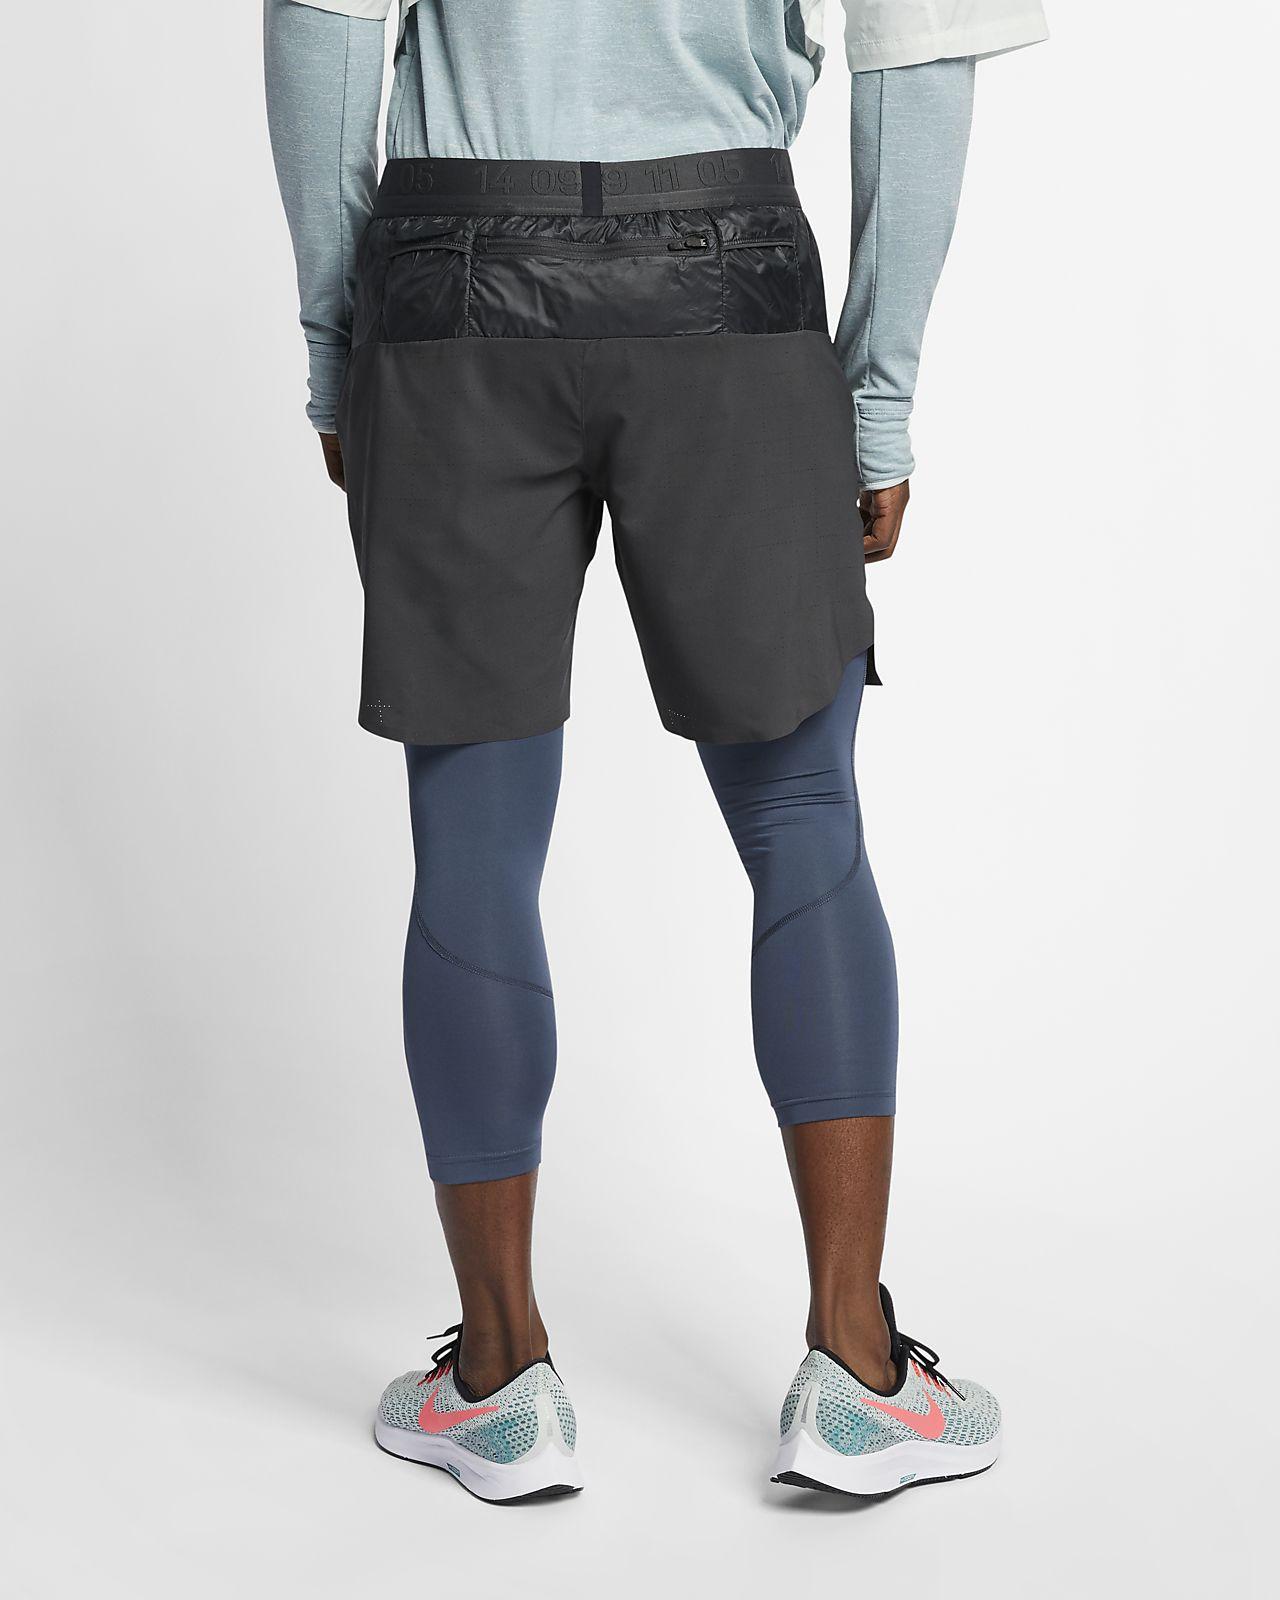 Short de running 2 en 1 Nike Tech Pack pour Homme